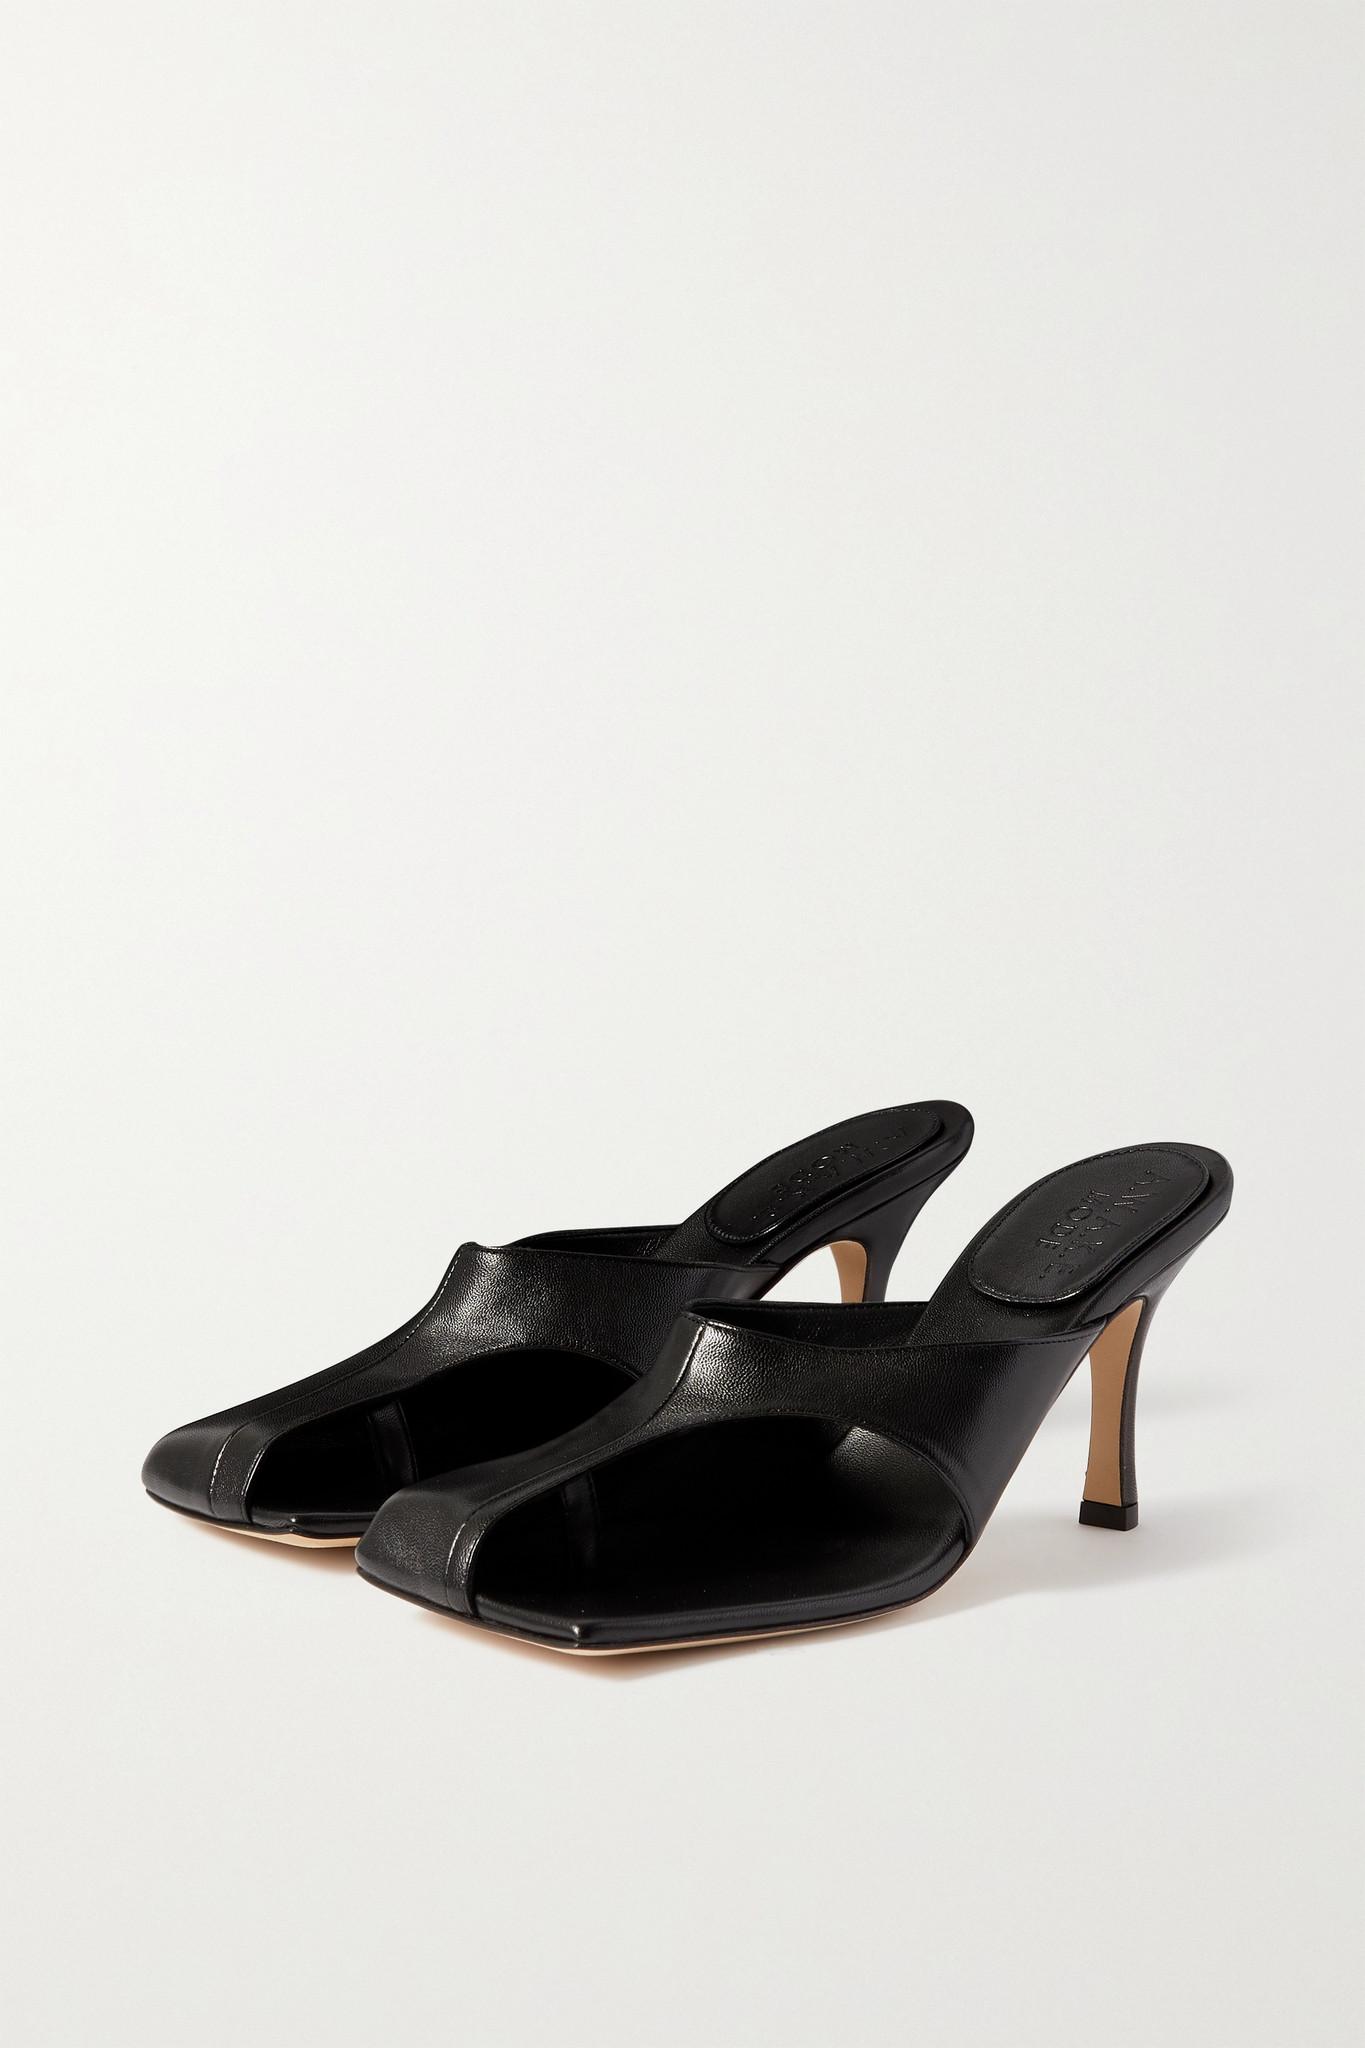 A.W.A.K.E. MODE - Mary Cutout Leather Mules - Black - IT39